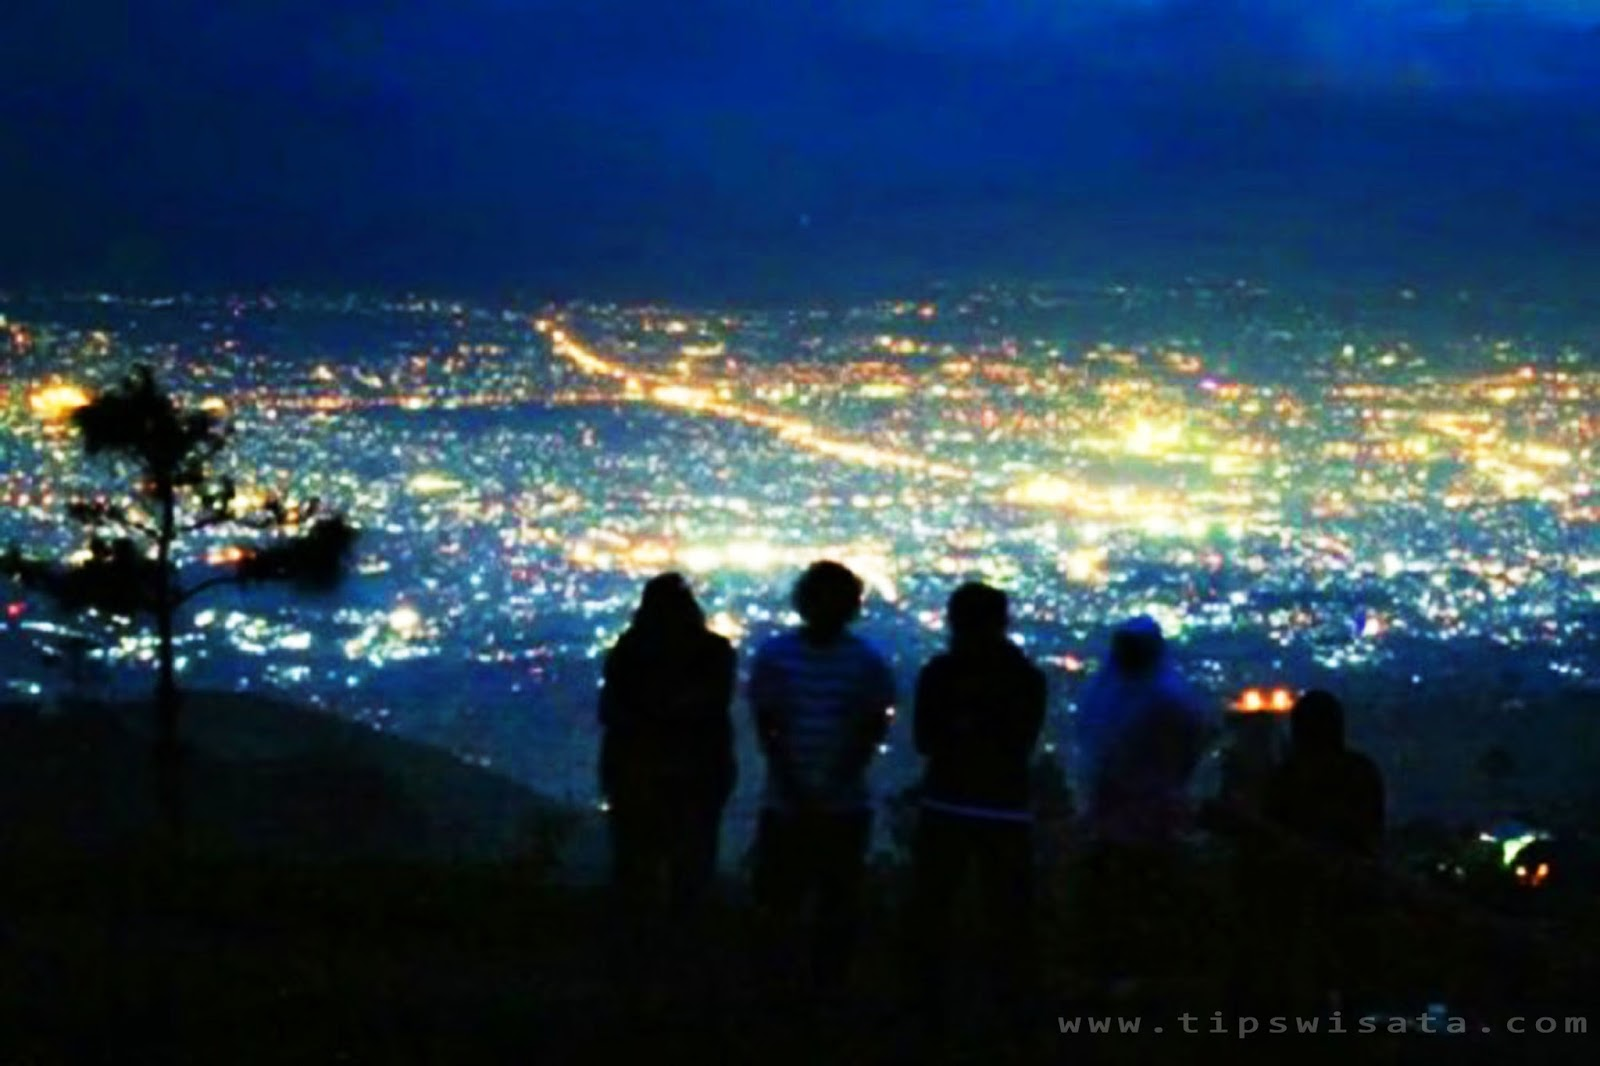 Panorama Wisata Bukit Moko Warung Daweung Cimenyan Bandung Pemandangan Malam